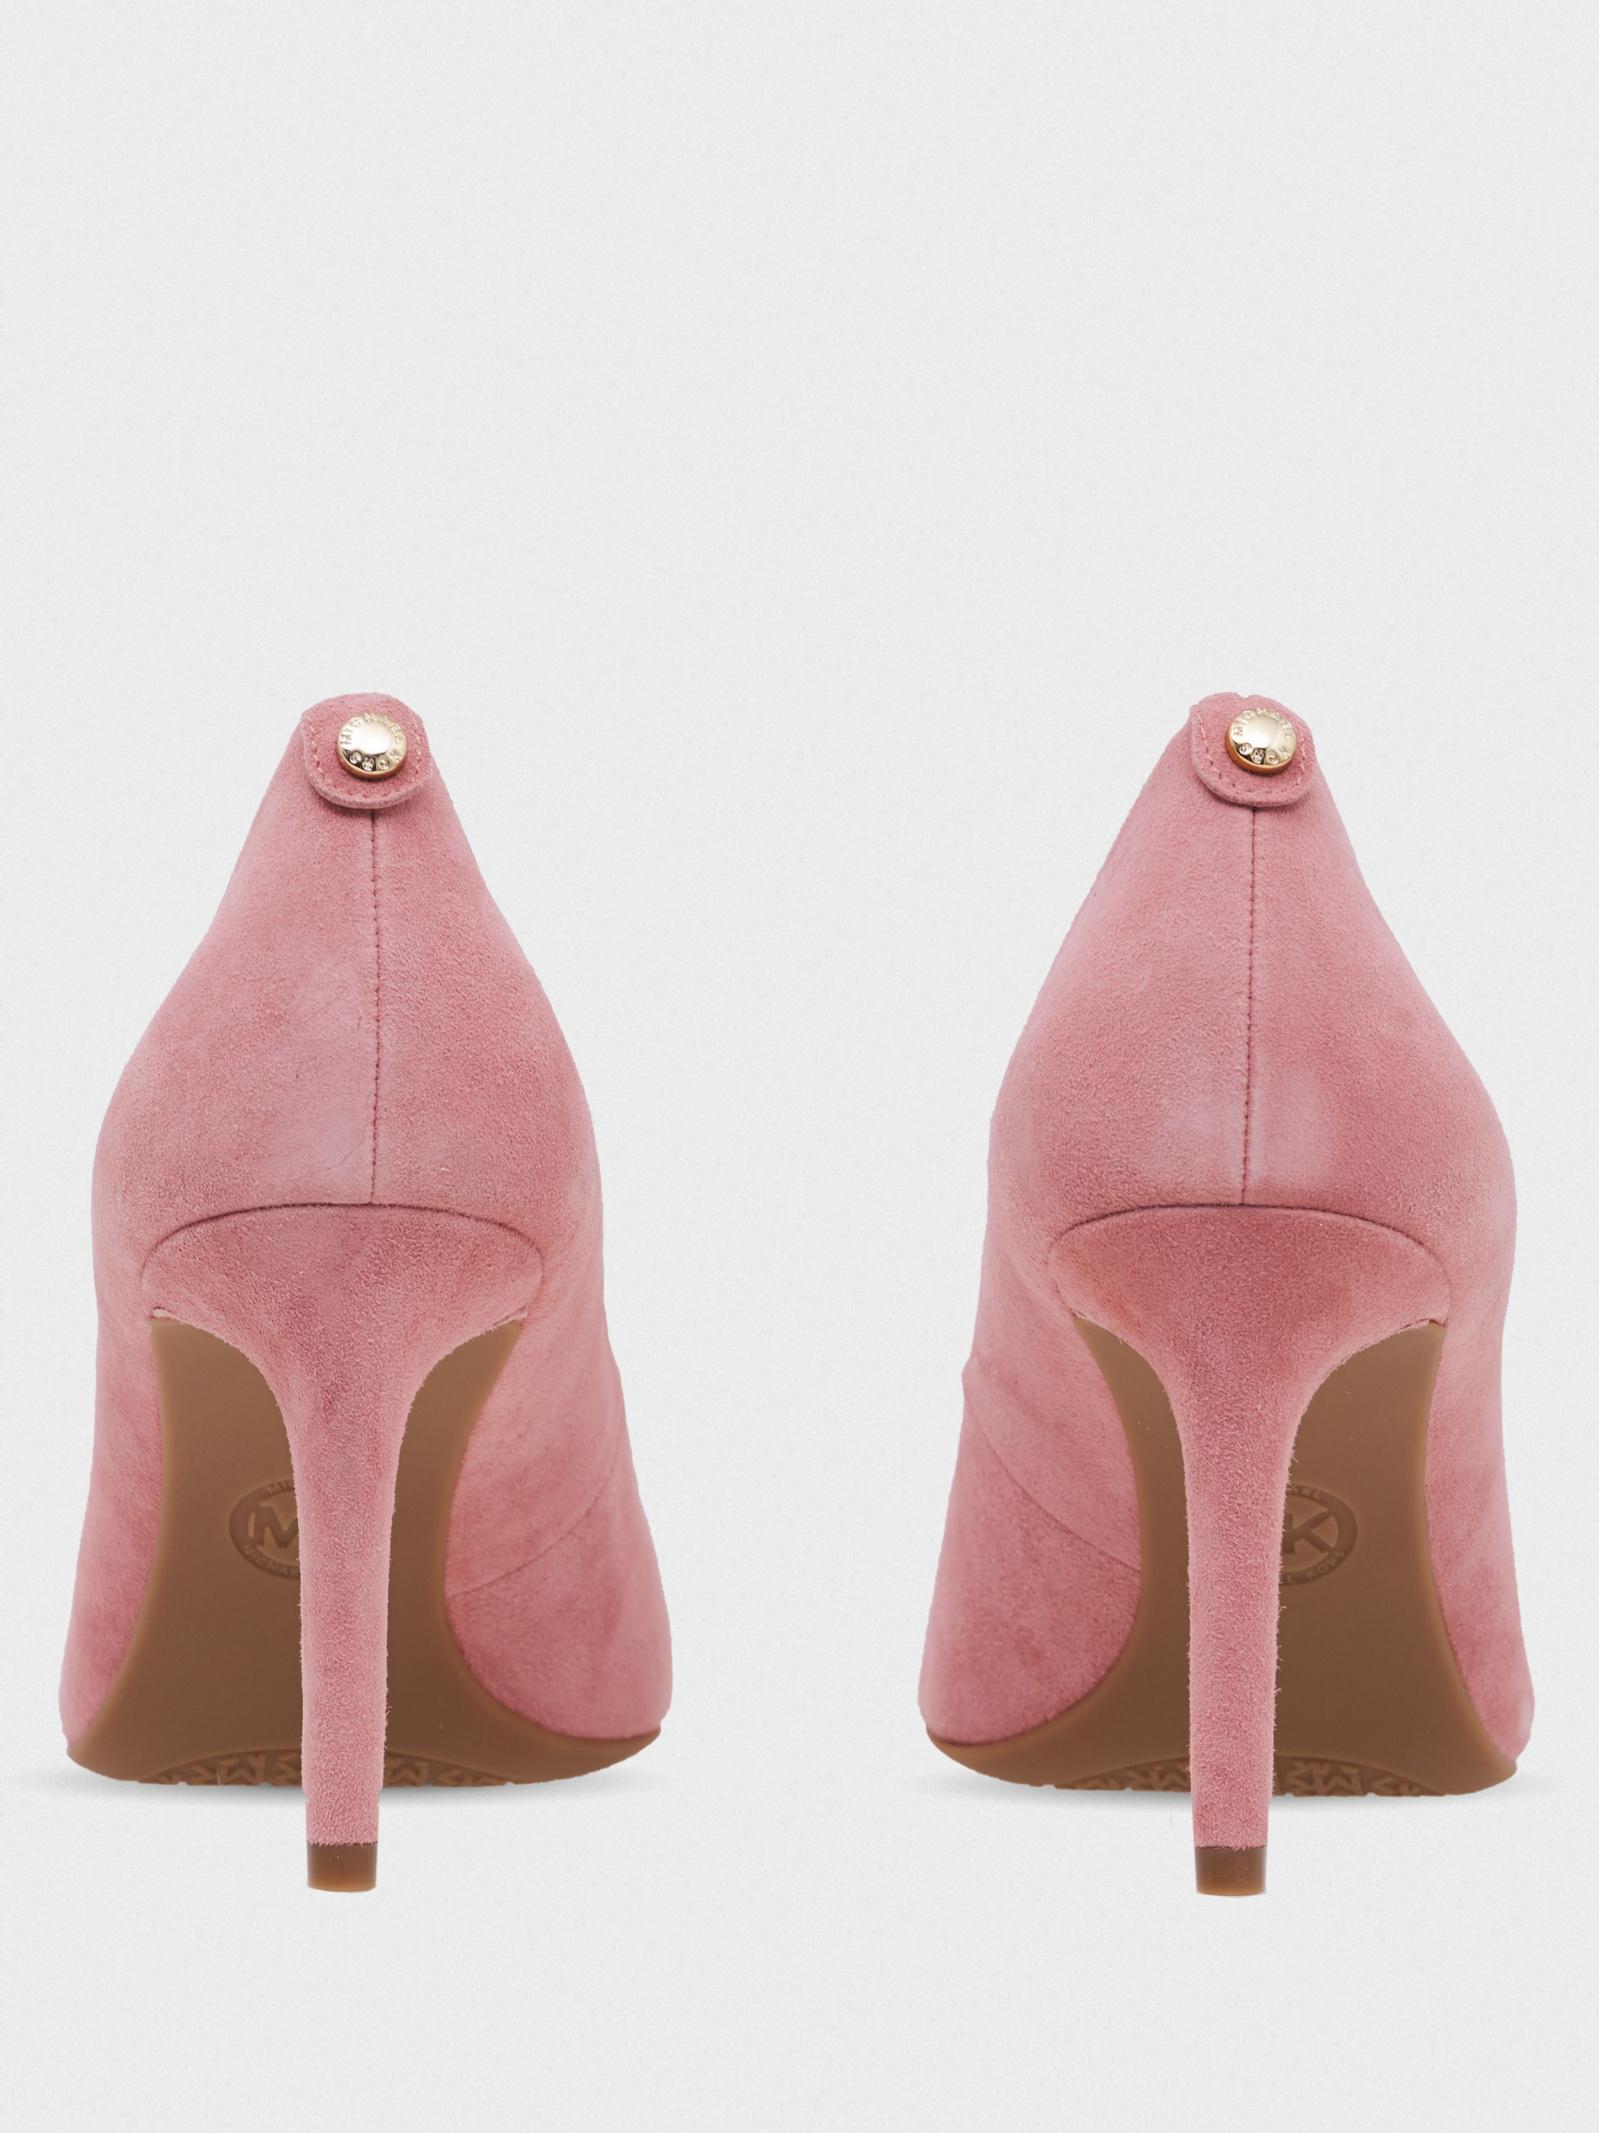 Туфли женские Michael Kors 40F6DOMP1S_635_821_0041 цена обуви, 2017